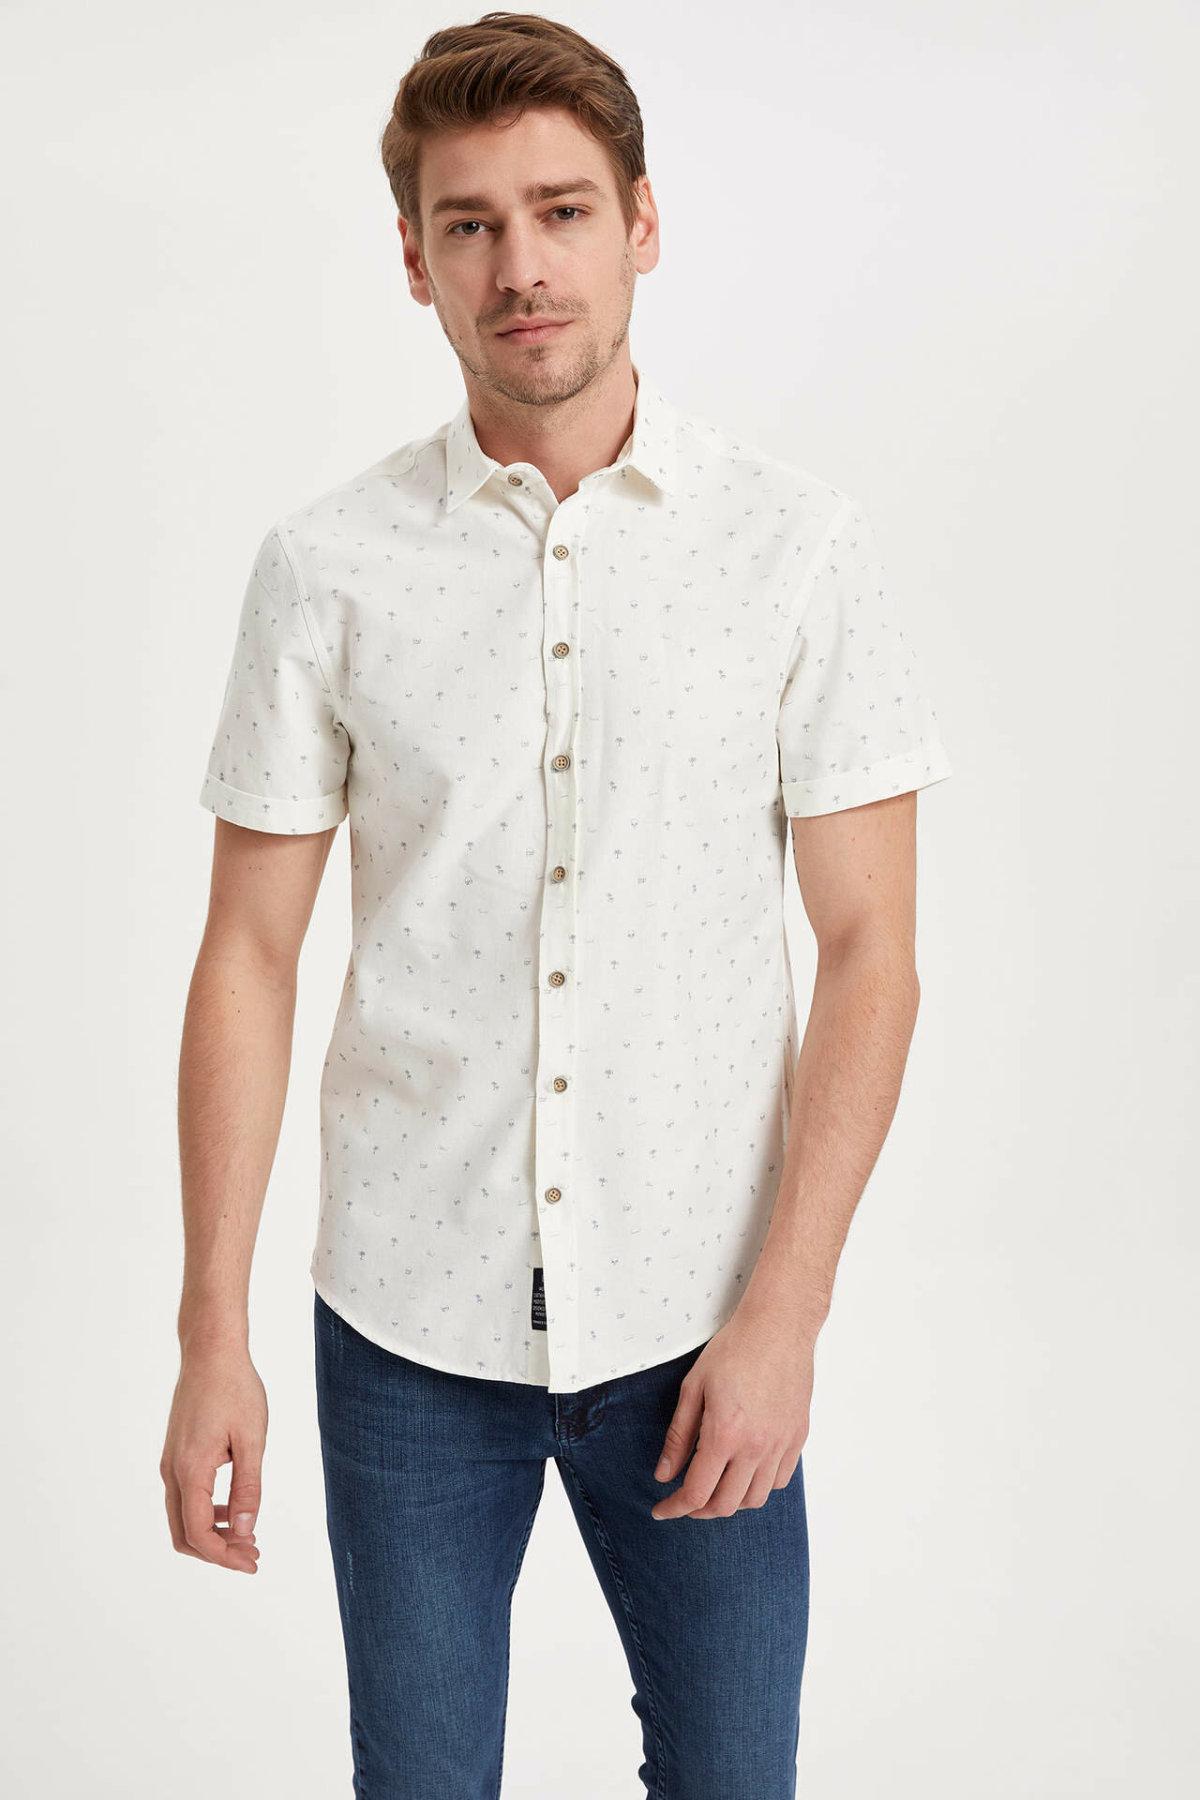 DeFacto Man Summer White Shirts Men Casual Short Sleeve Tops Male Fit Loose Shirt Men Top Cloth-K3903AZ19SM